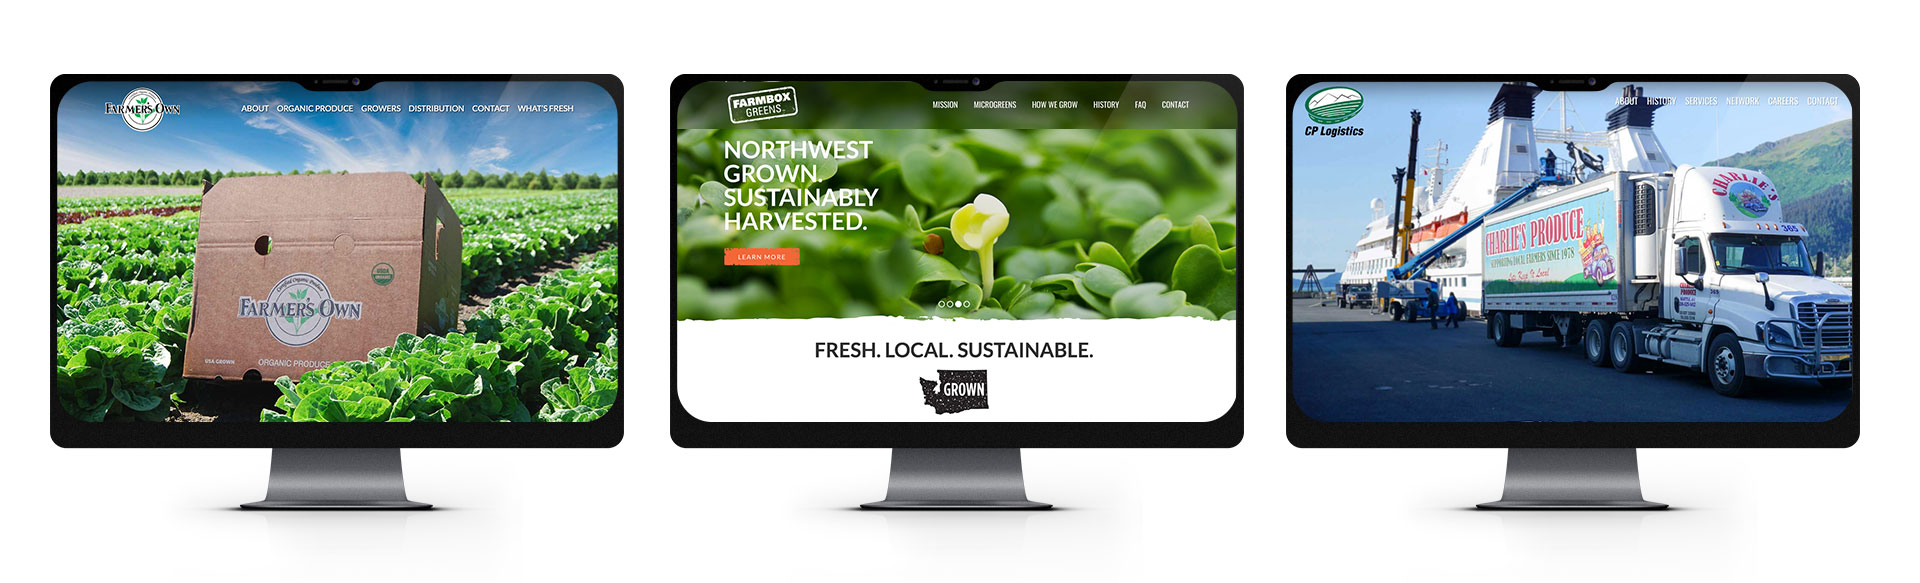 Charlie's Produce Company Website | Seattle Marketing Agency | CMA